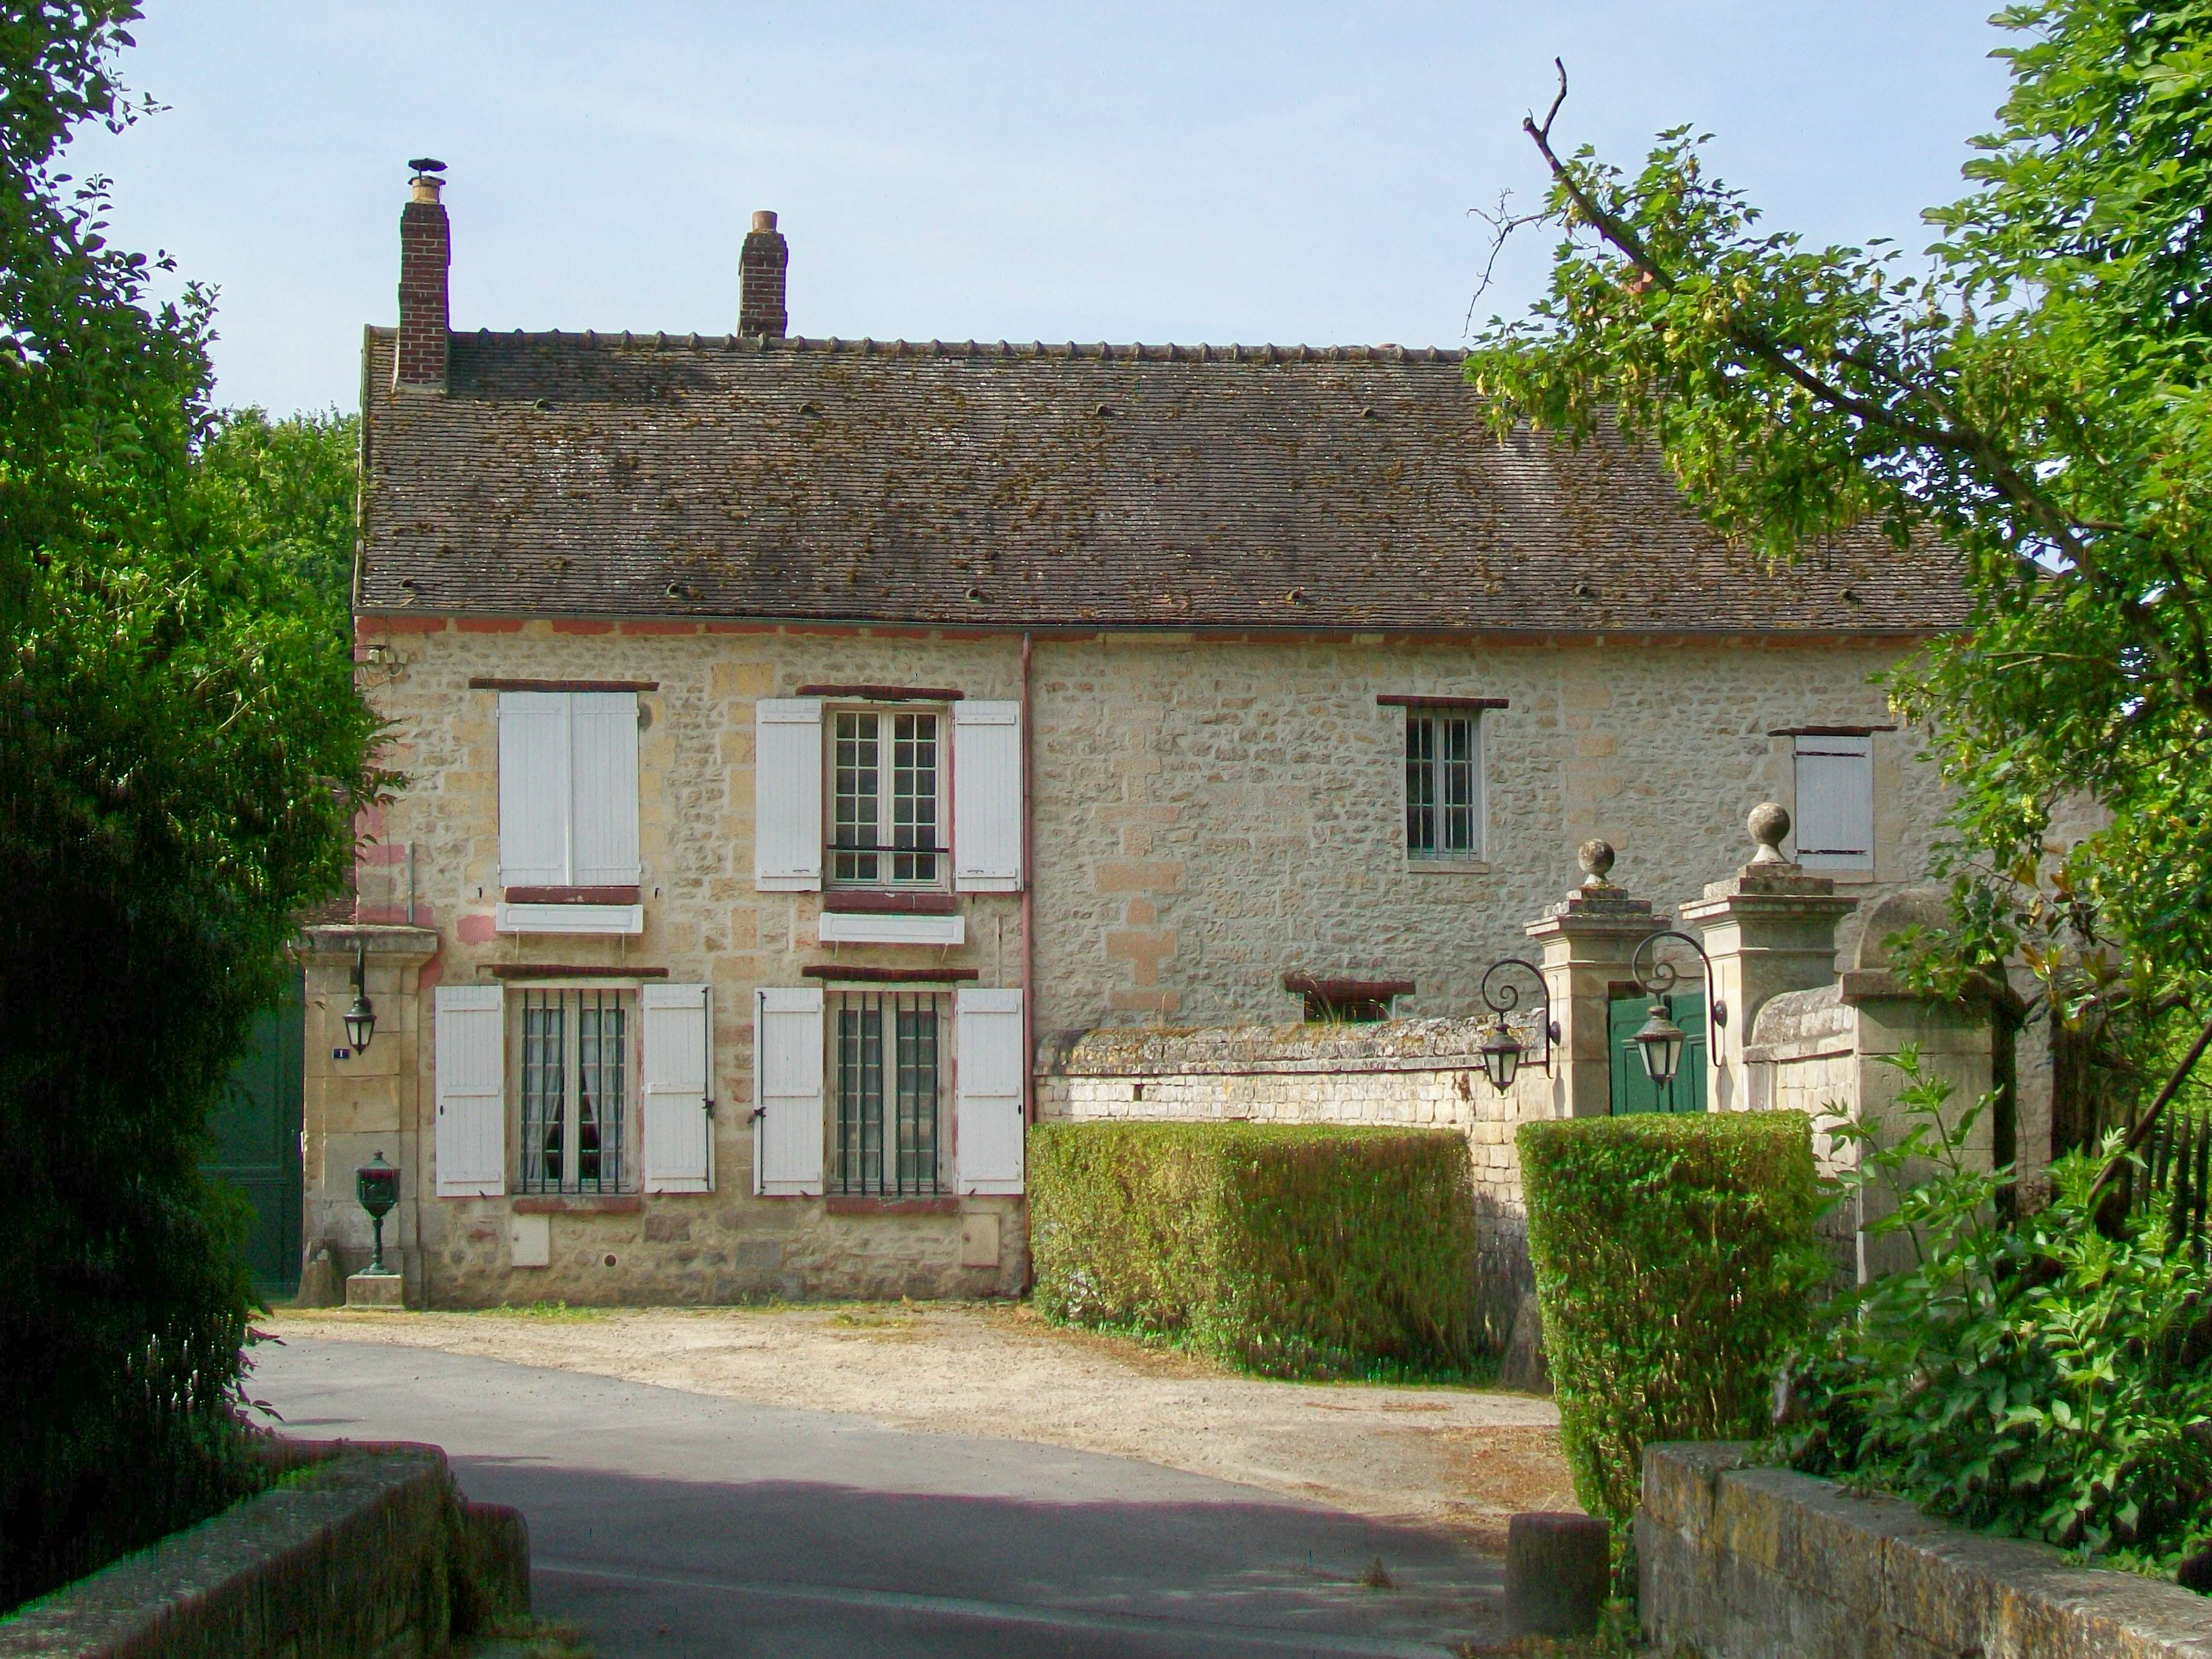 File:Avilly Saint Léonard, Logis De La Ferme Du0027Avilly.